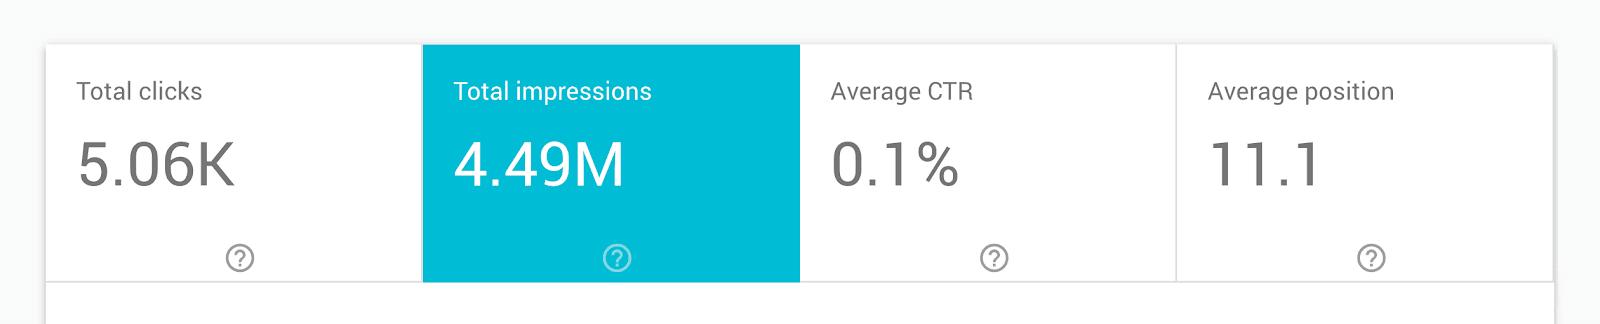 Статистика по посту из блога